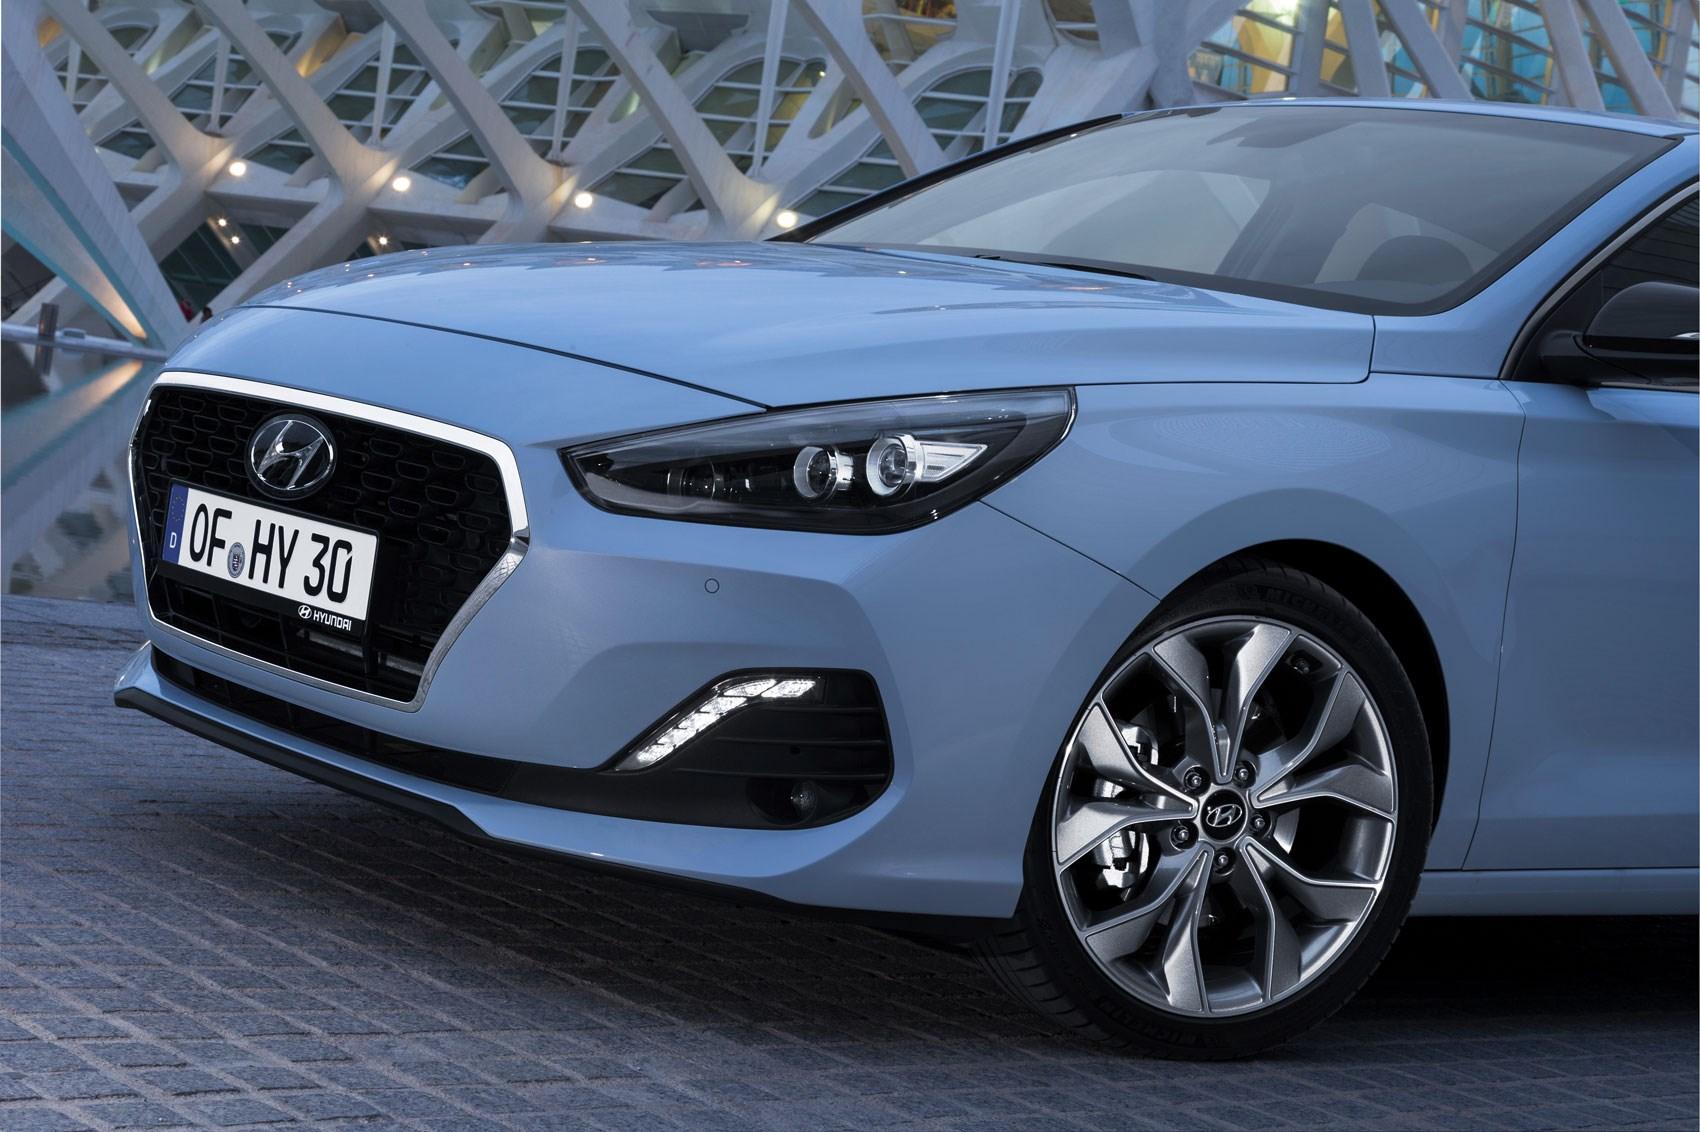 Hyundai i30 Fastback front detail